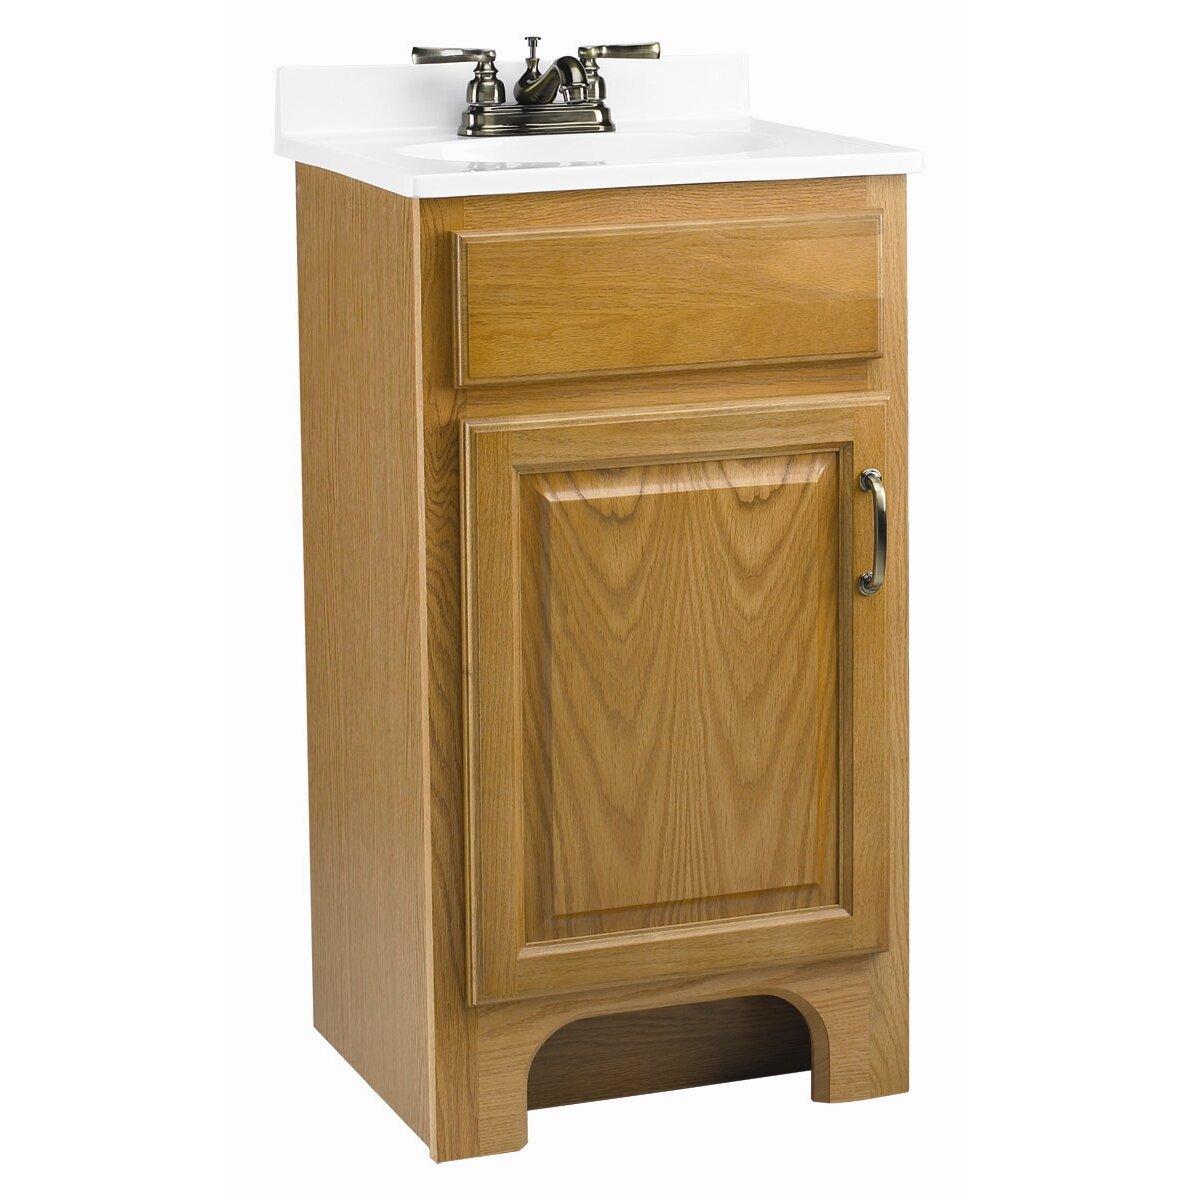 Design house richland 19 single door cabinet bathroom for Bathroom cabinets reviews